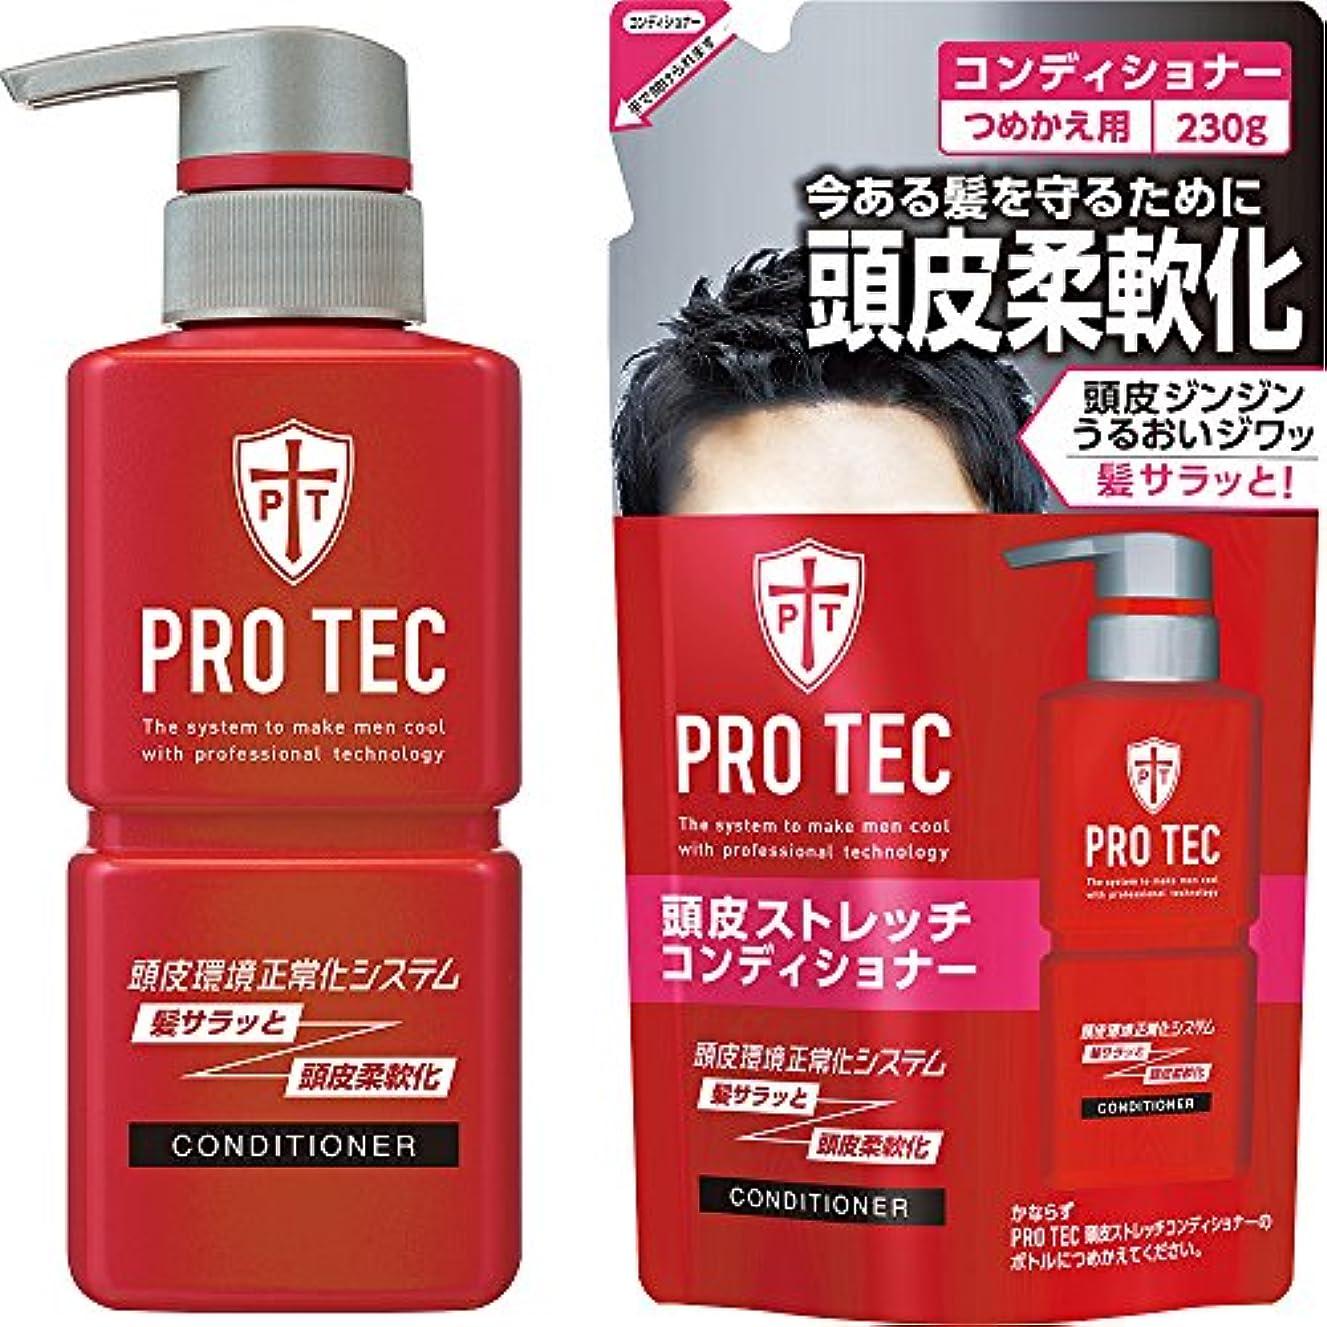 PRO TEC(プロテク) 頭皮ストレッチコンディショナー 本体ポンプ300g+詰め替え230g セット(医薬部外品)